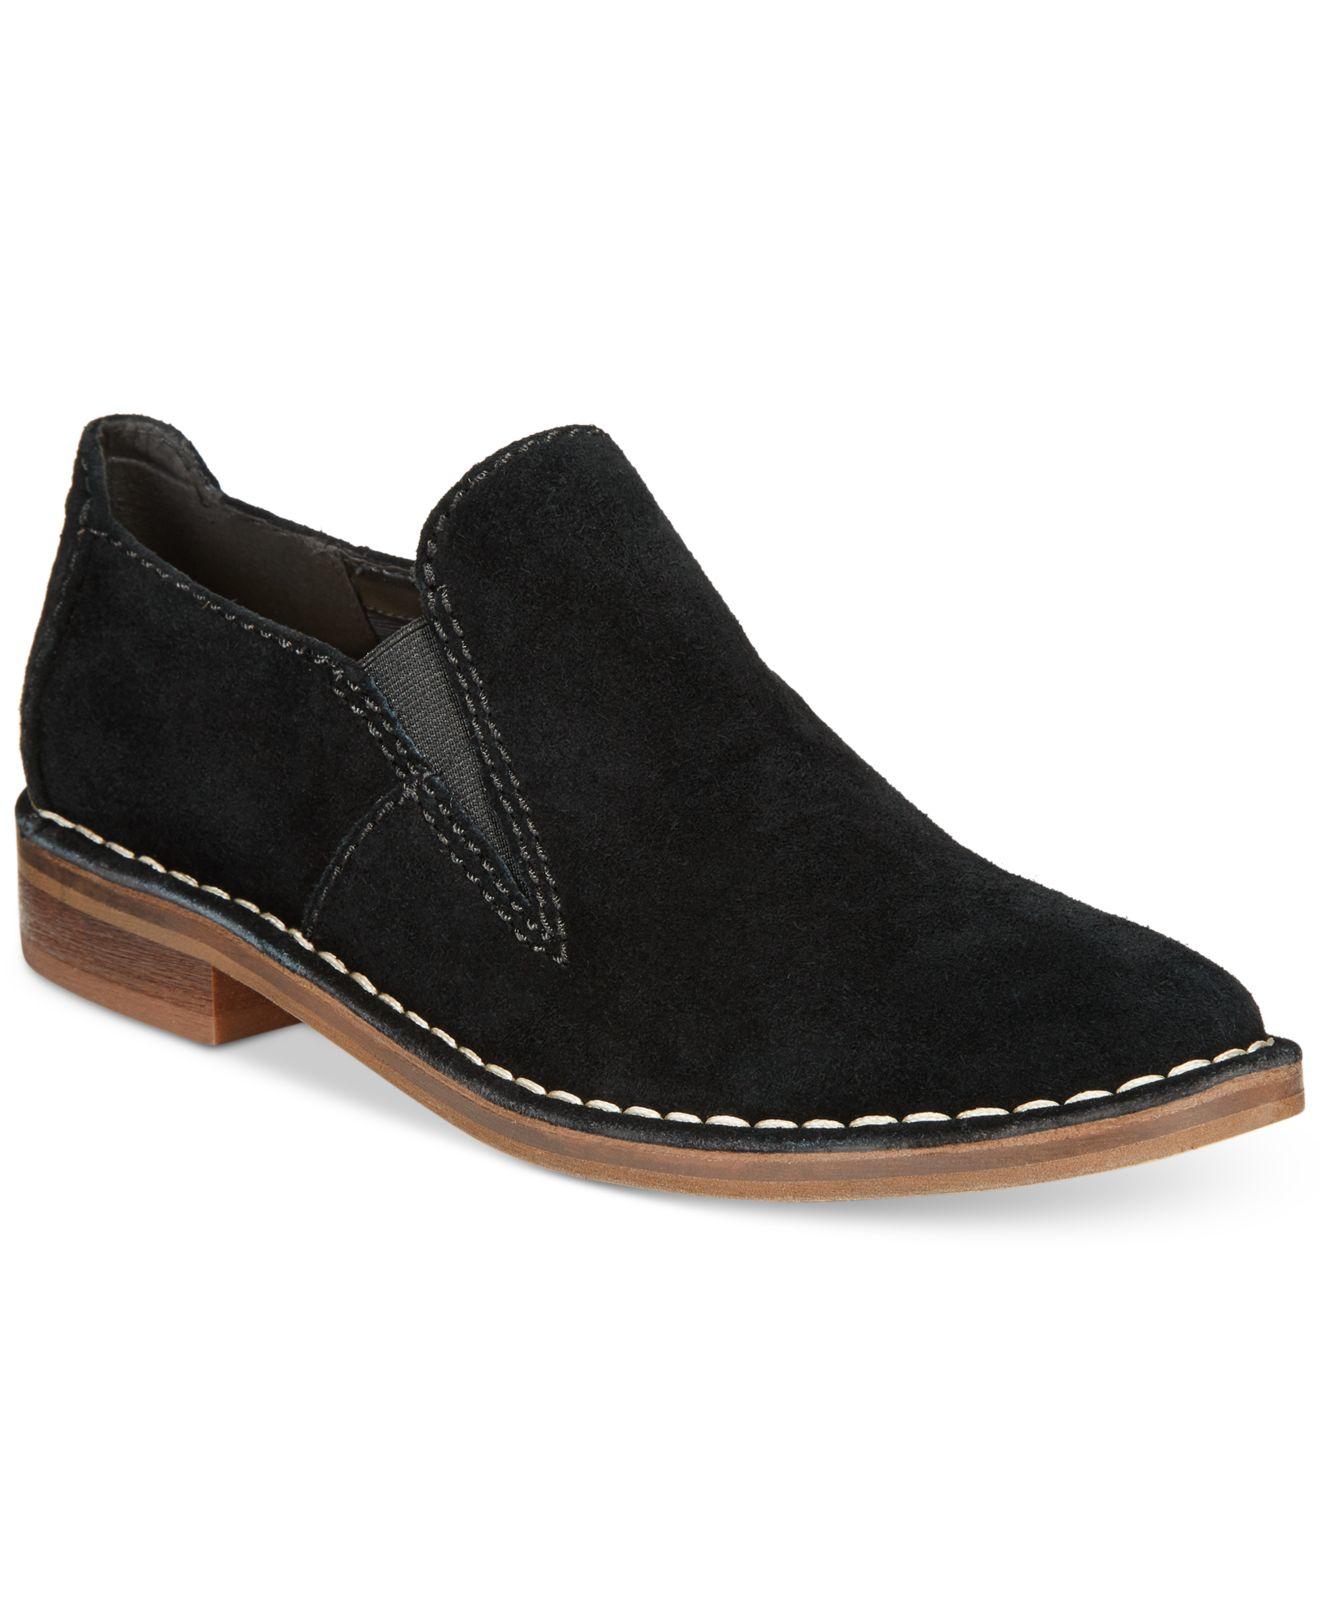 Womens Shoes Clarks Cabaret City Black Suede